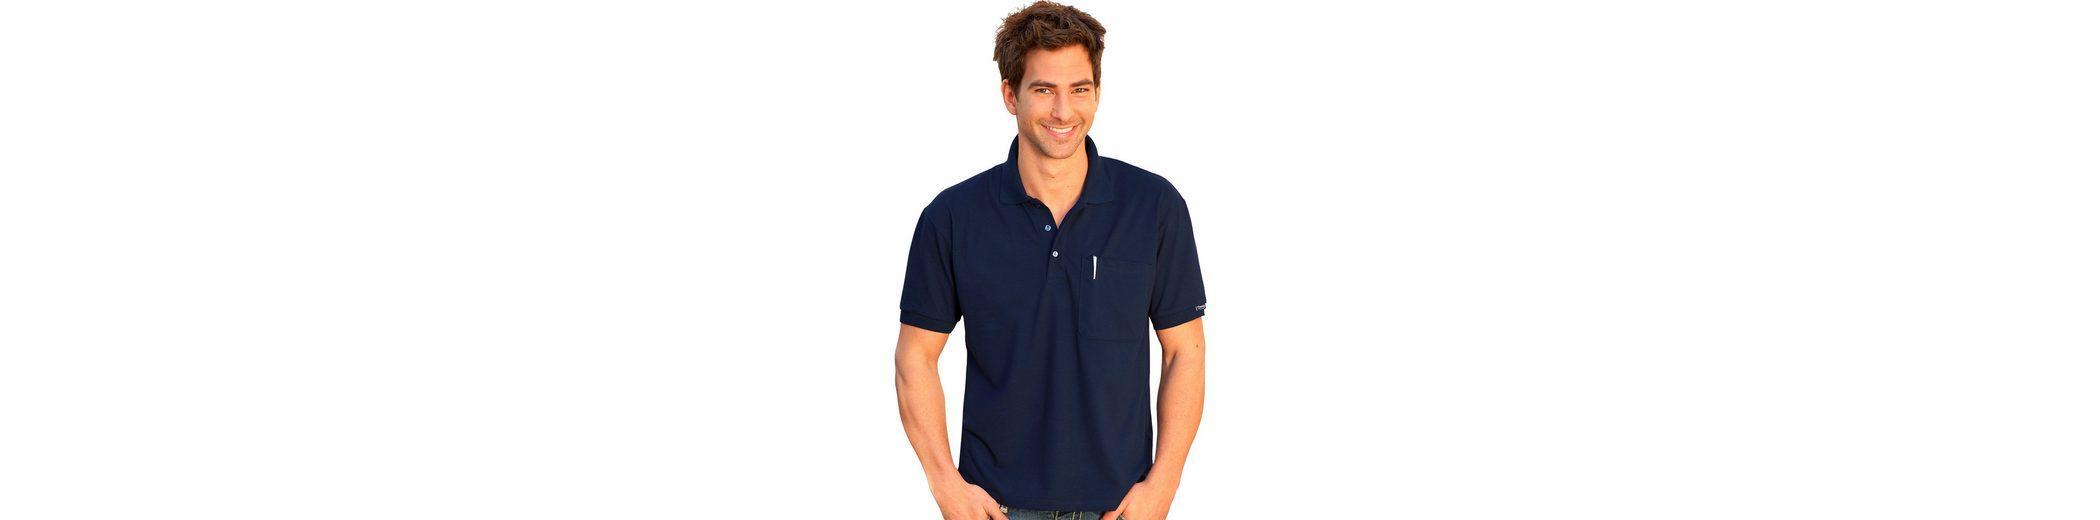 Polo Brusttasche mit TRIGEMA Shirt Polo verst盲rkter TRIGEMA qxpEOpwa